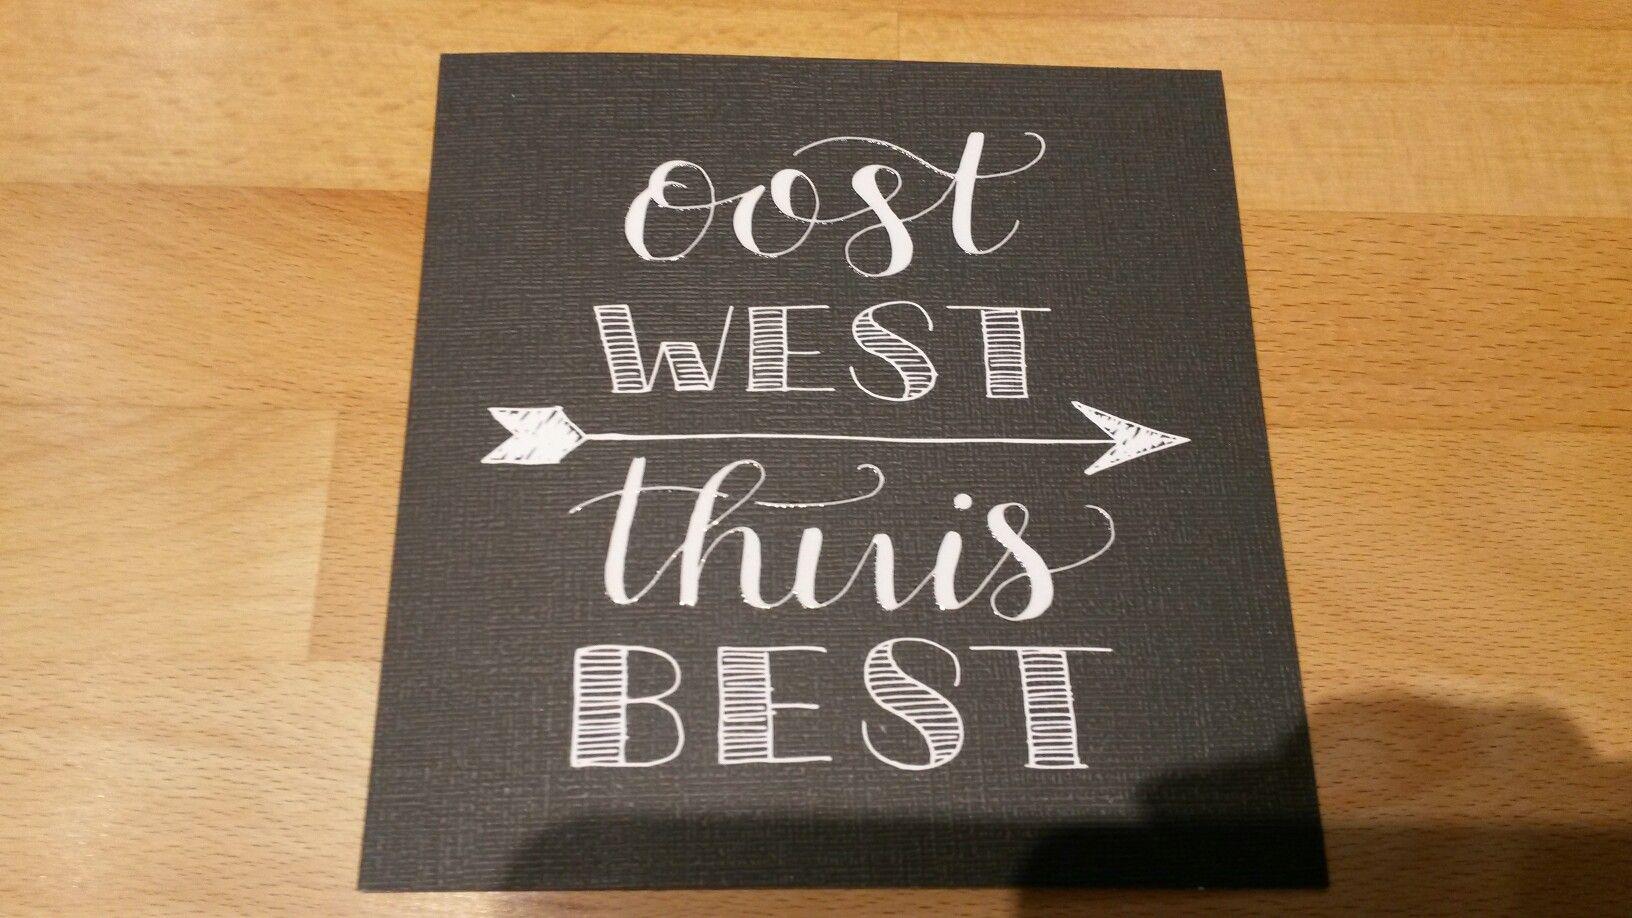 Oost west, thuis best | Handlettering | Pinterest